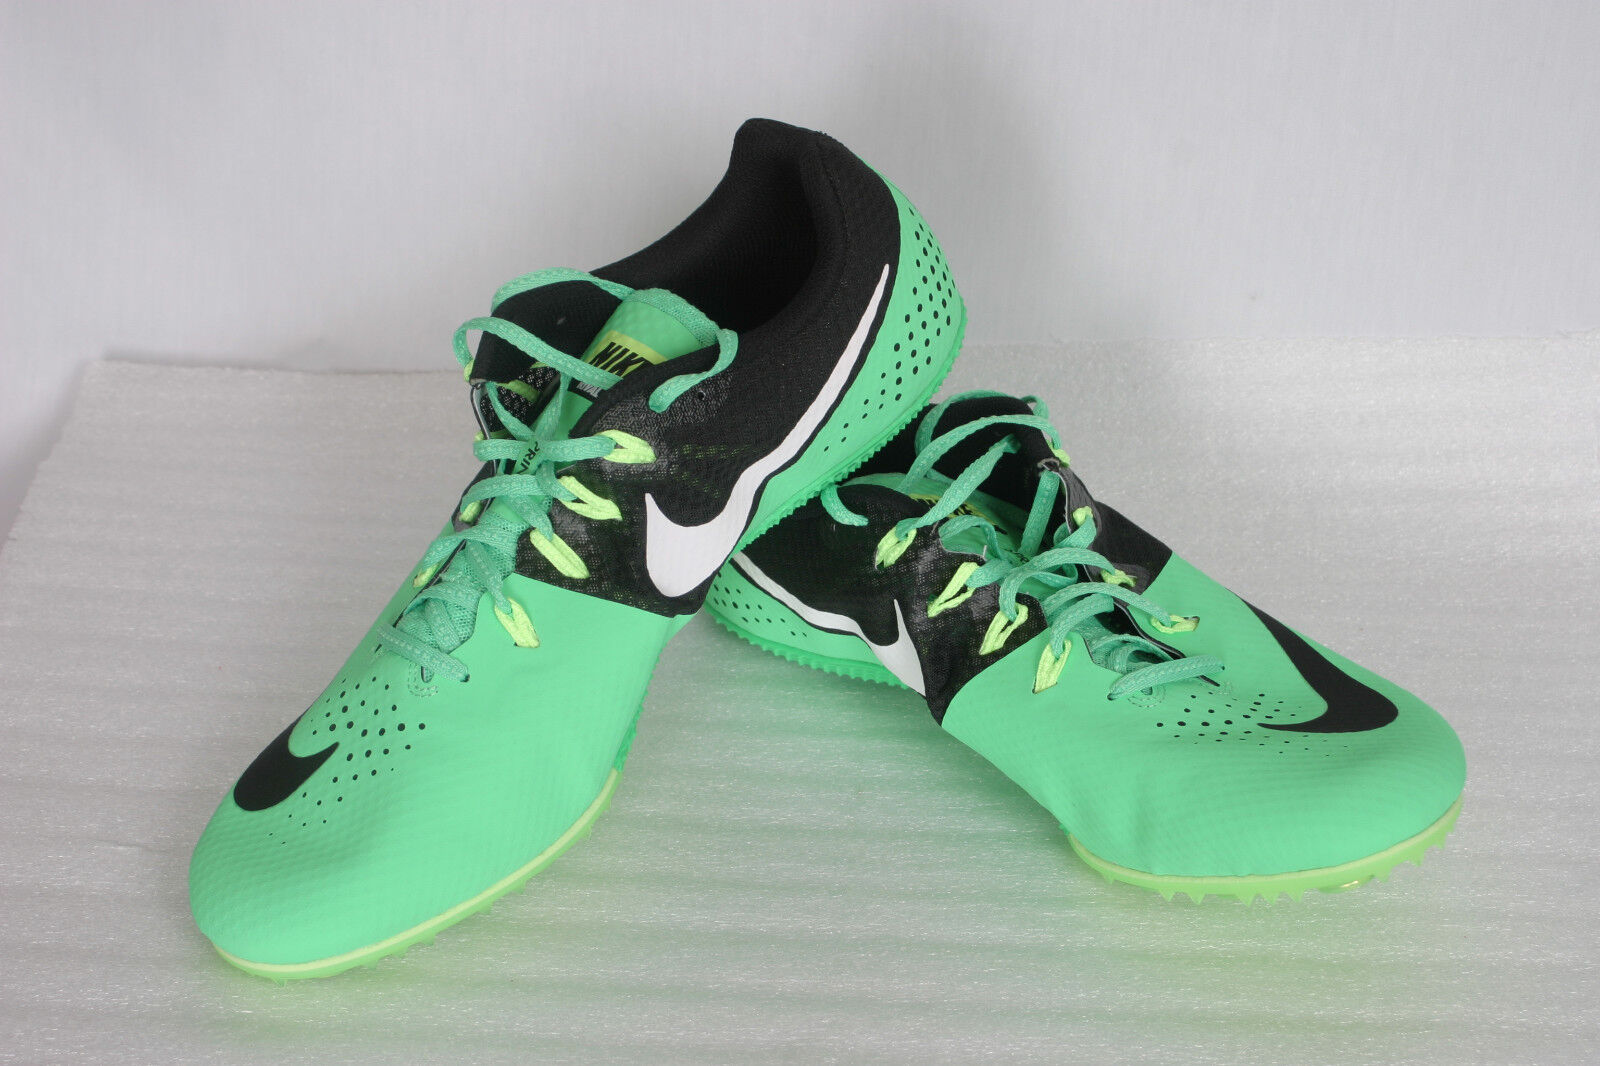 Nike - rivale s mens 8 weg sprint spitzen schuhe grün 806554-303 mens s größe. 7f05f9